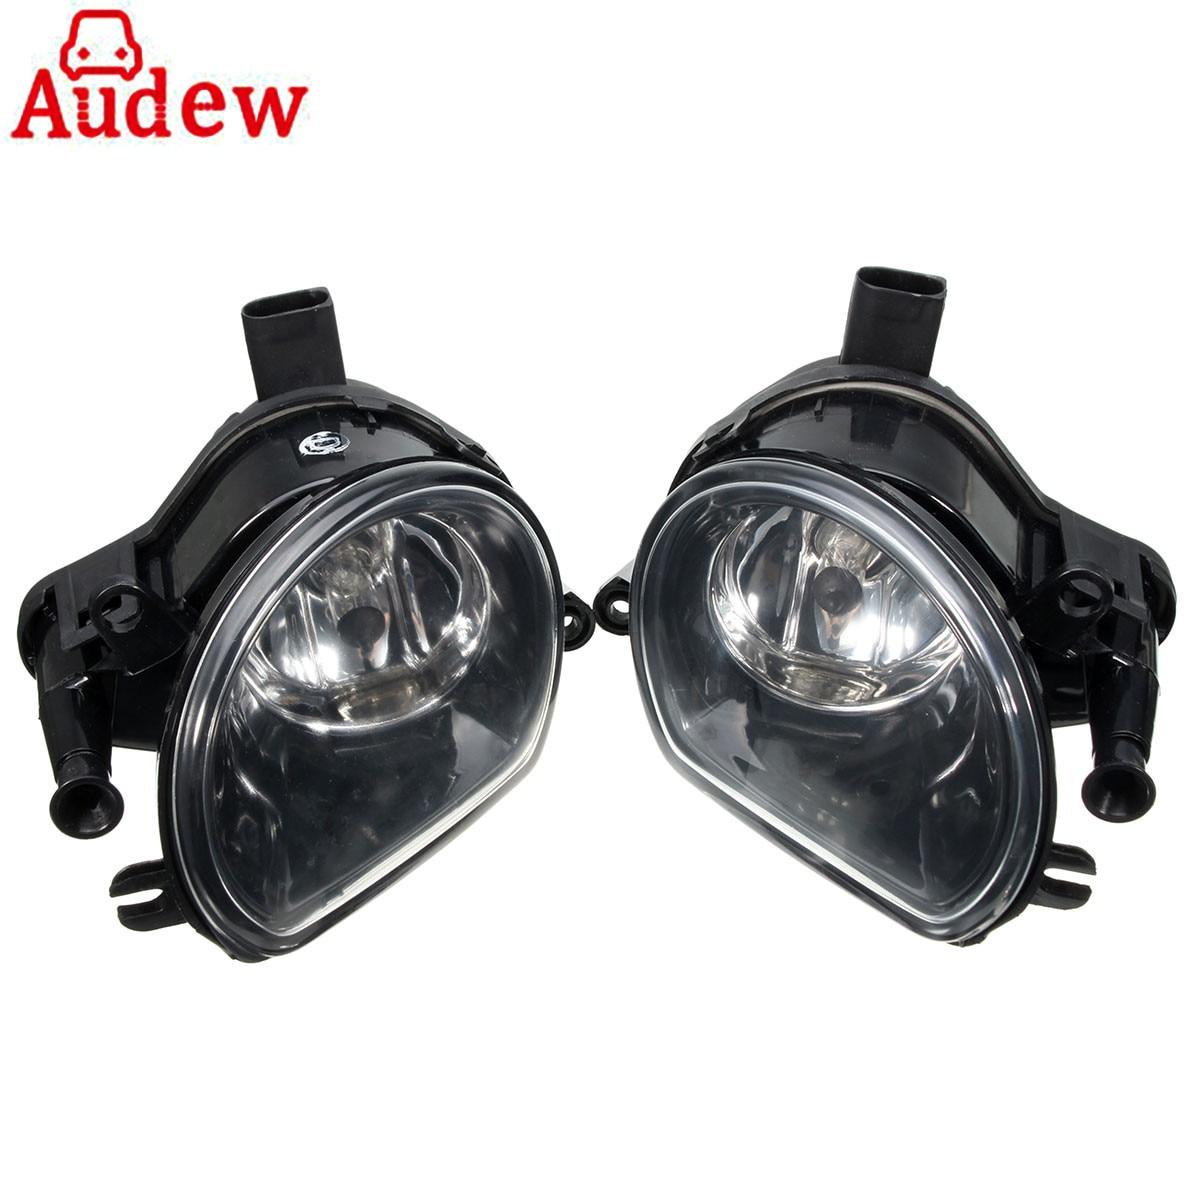 Pair Amber Fog Light Lamp Front Bumper Halogen Clean Fog Lamps Foglights For Audi Q7 07-09/A3 04-08 8P0941699A